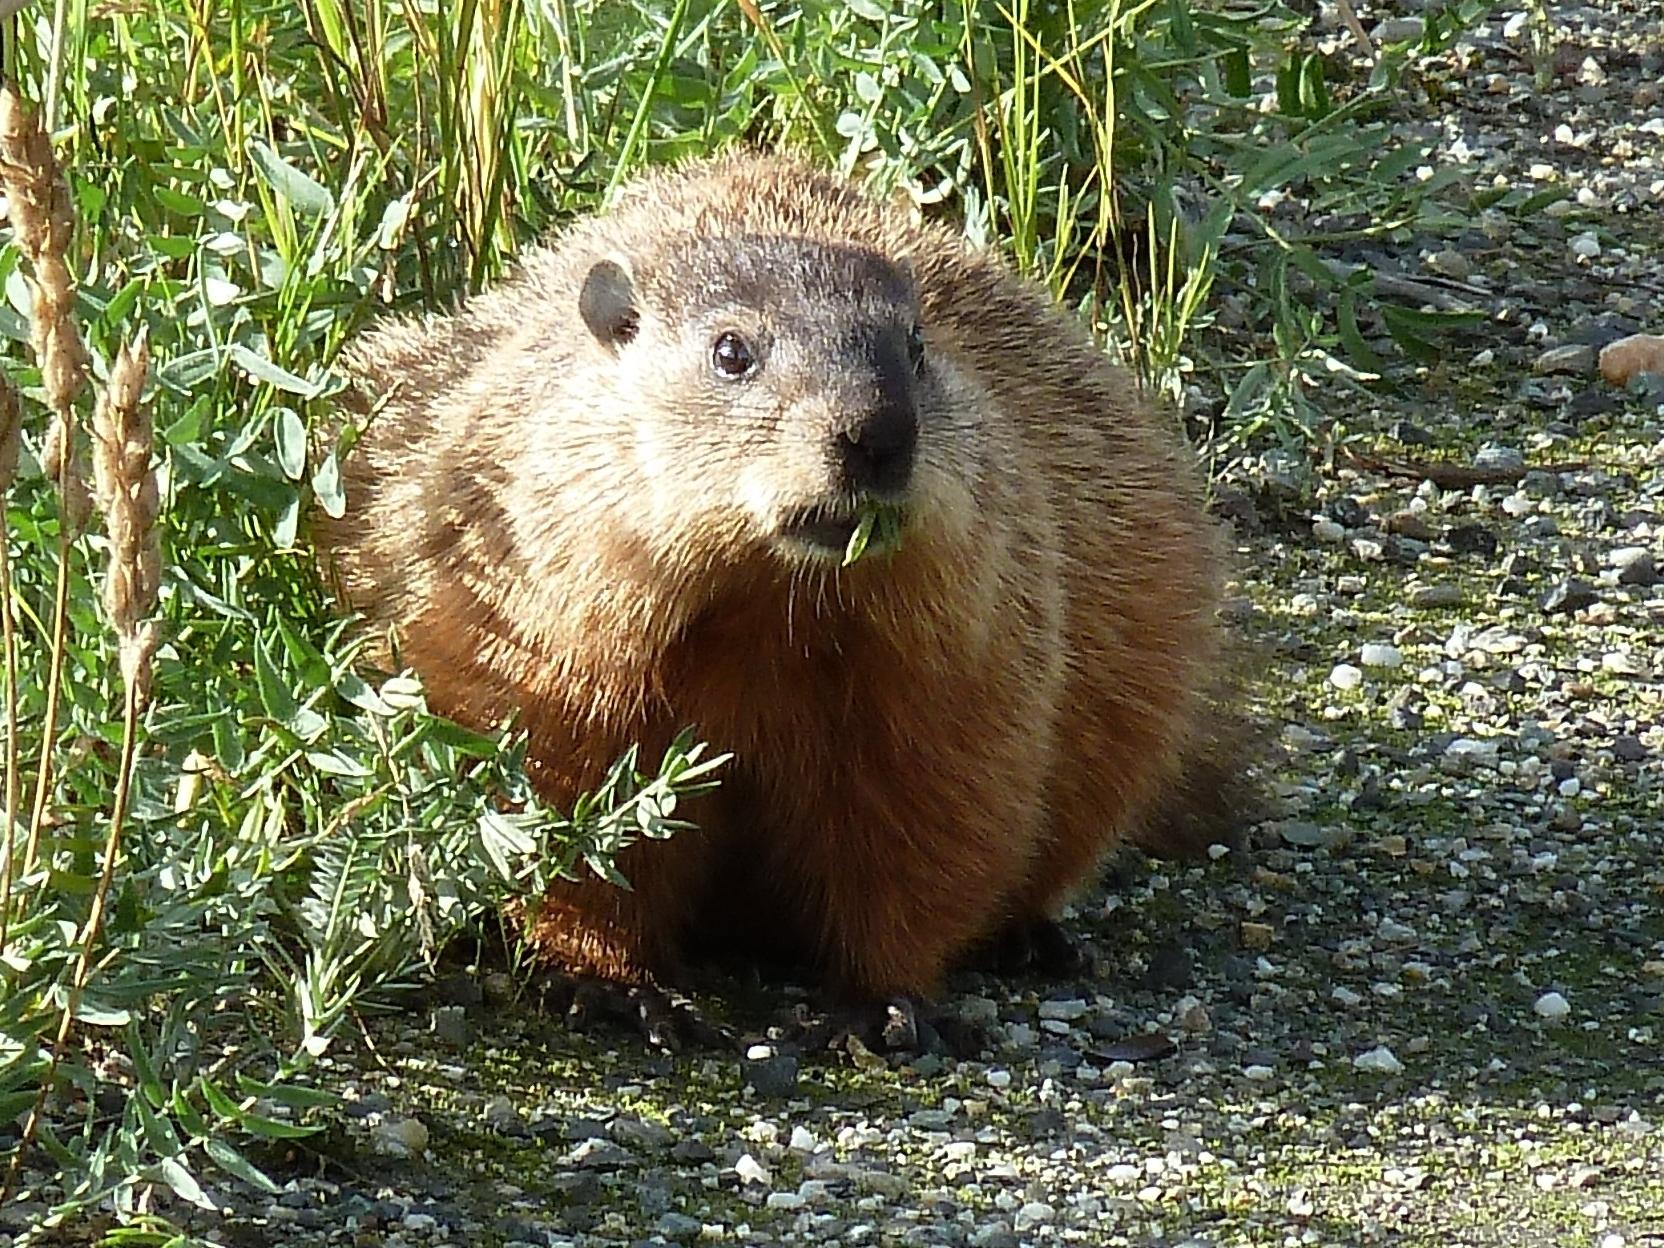 Radreise Alaska 2010 - Murmeltier (Hoary Marmot)